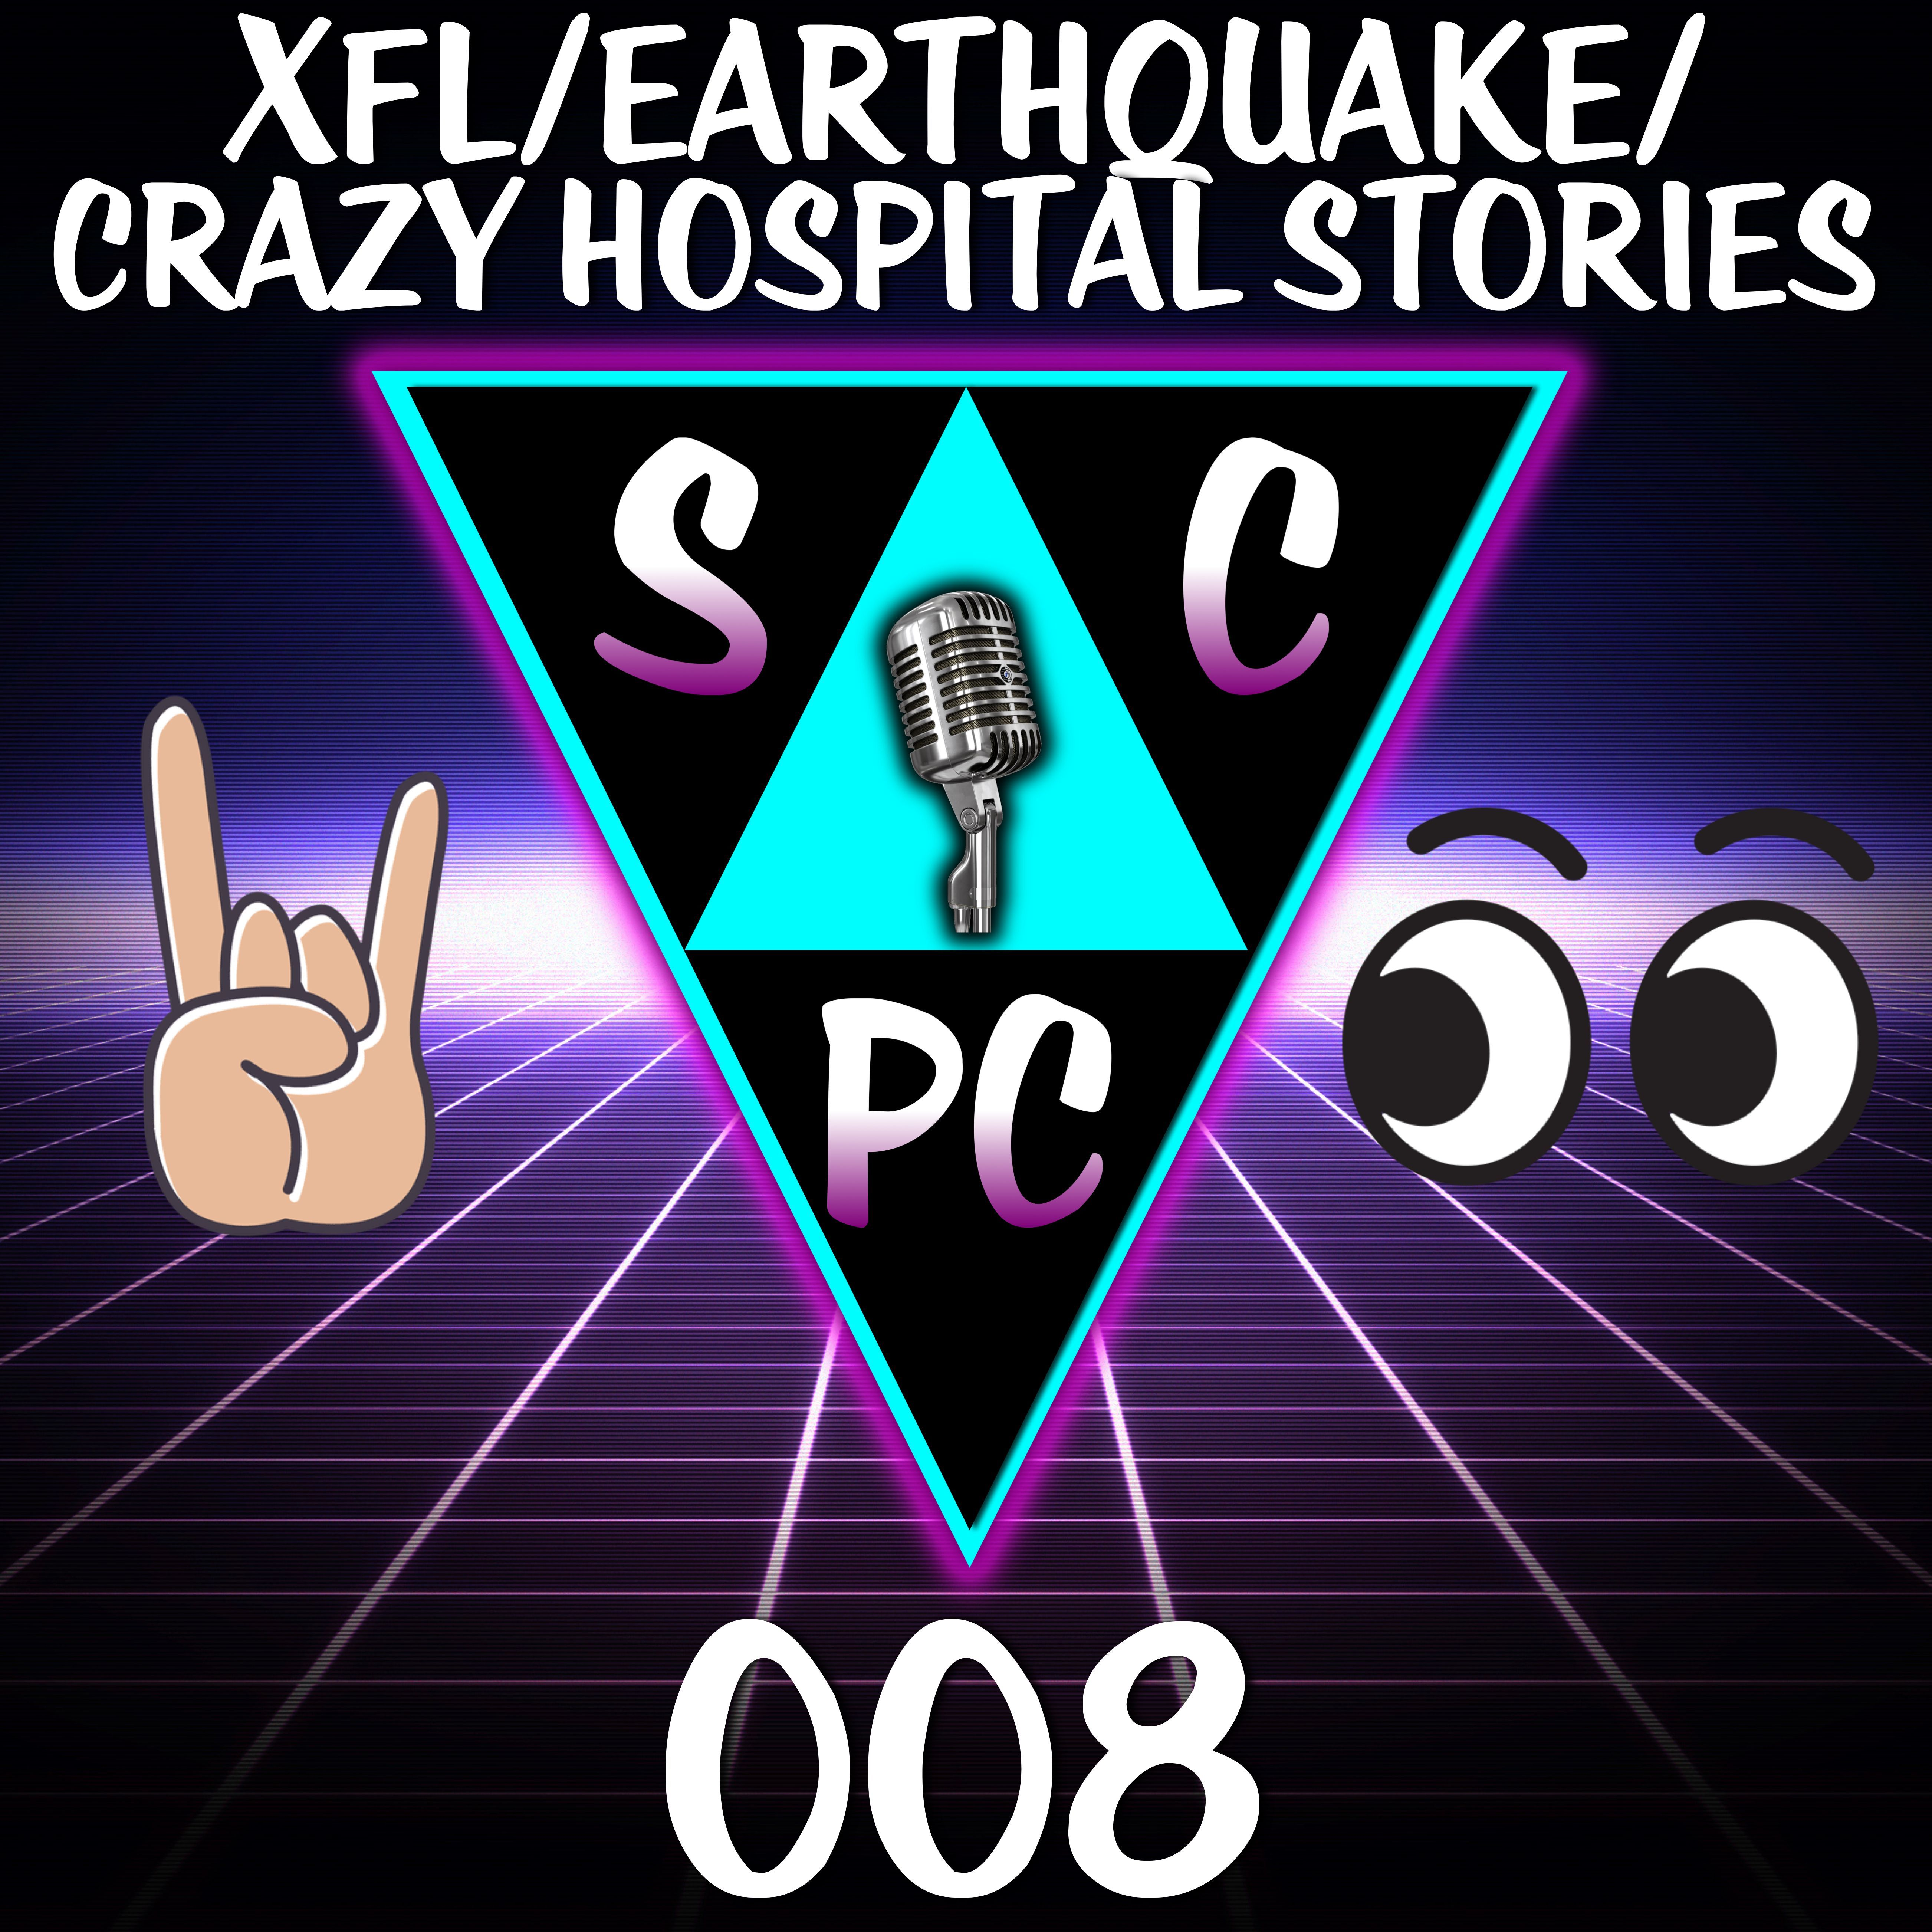 SquadCast PodCast 008 - XFL/Earthquake/Crazy Hospital Stories